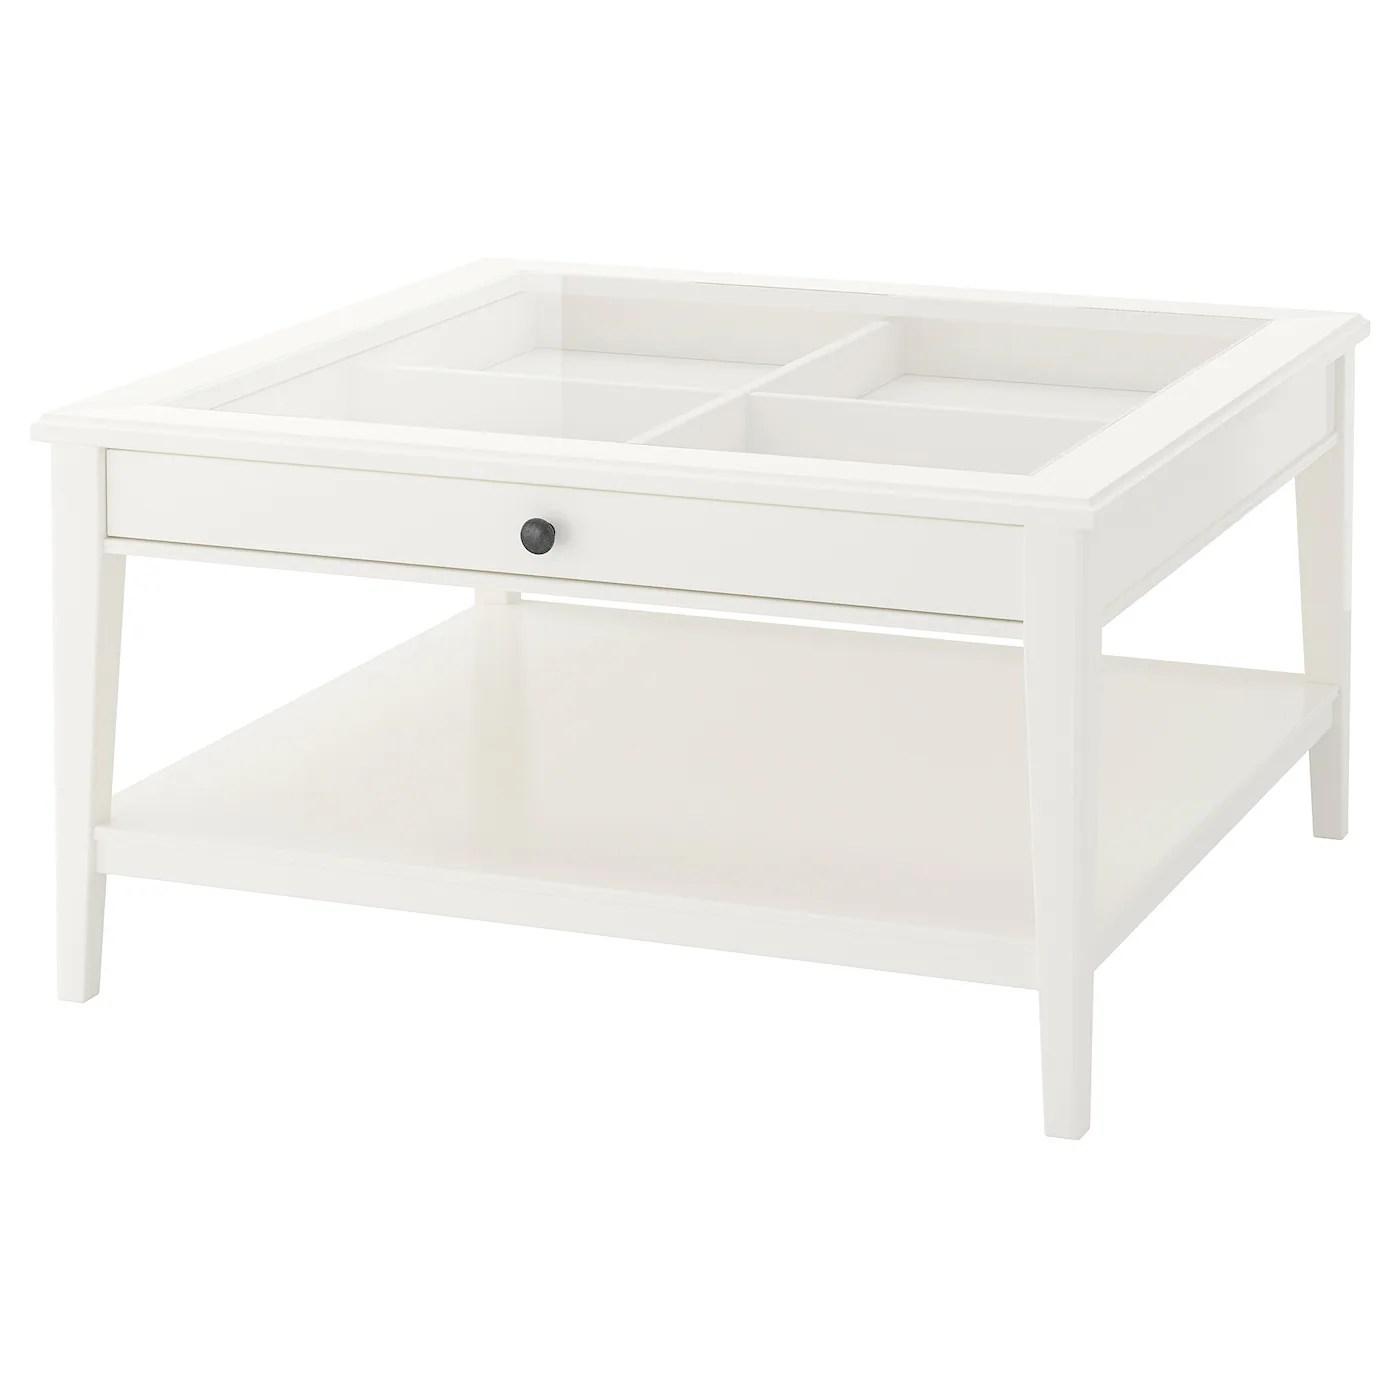 liatorp coffee table white glass 93x93 cm